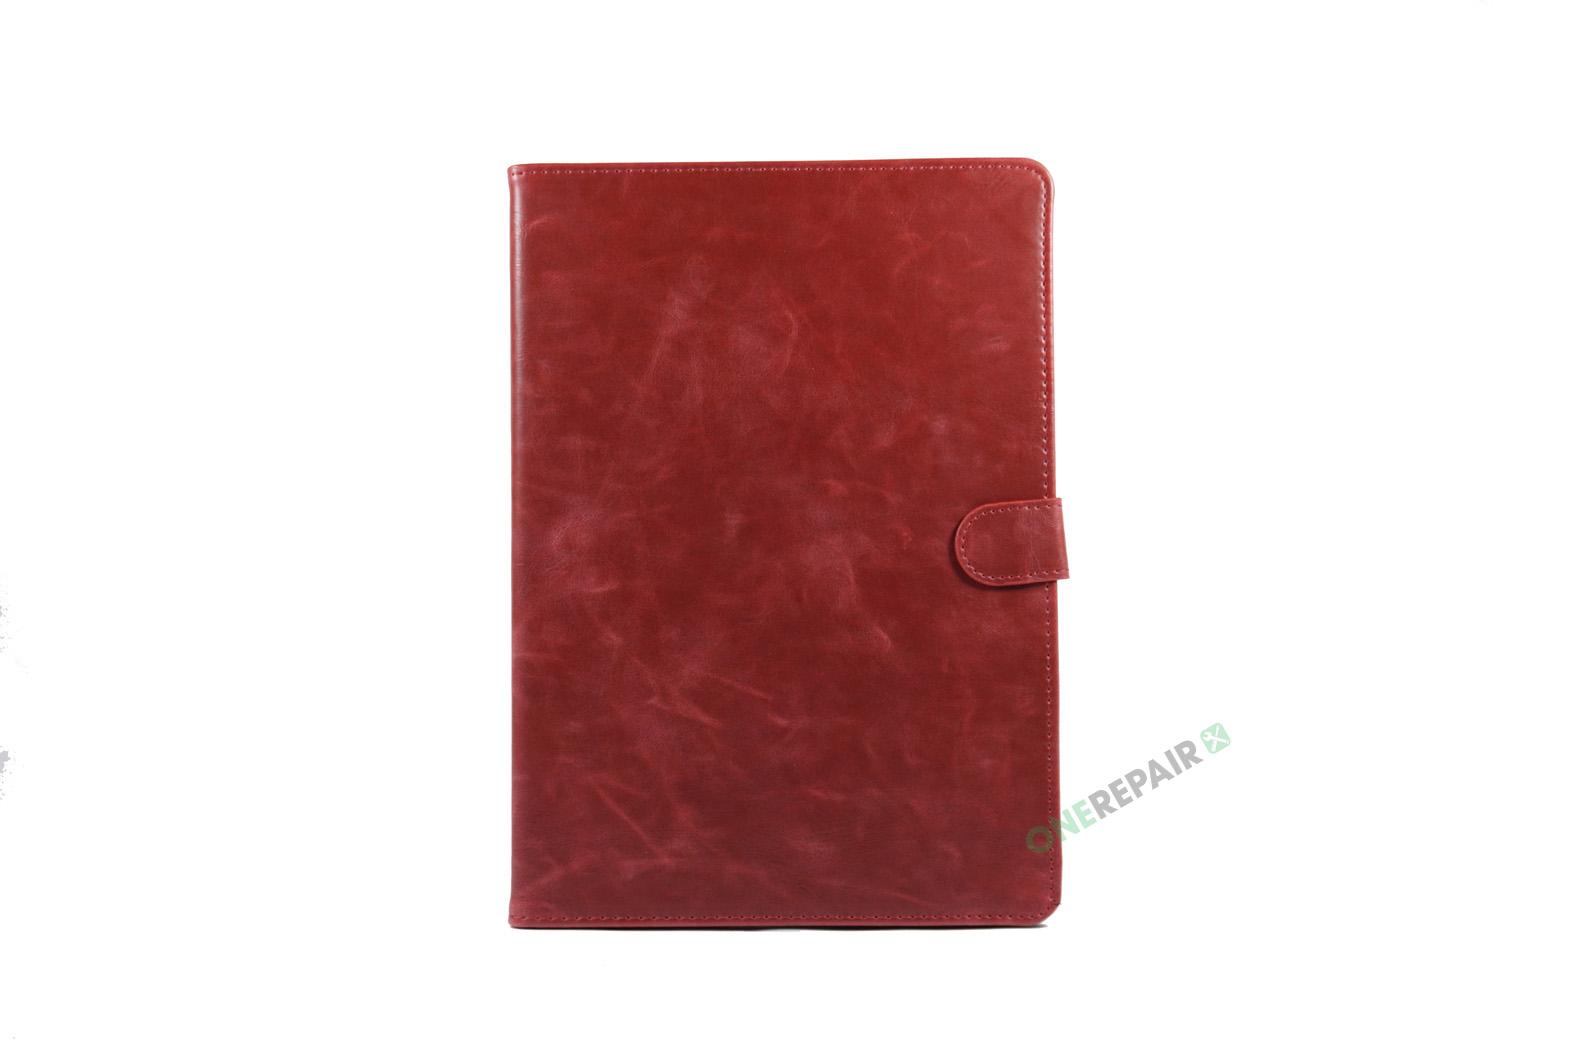 351756_iPad_Air2_2_A1566_A1567_Flipcover_Boeg_Roedbrun_Brun_Roed_Book_00001